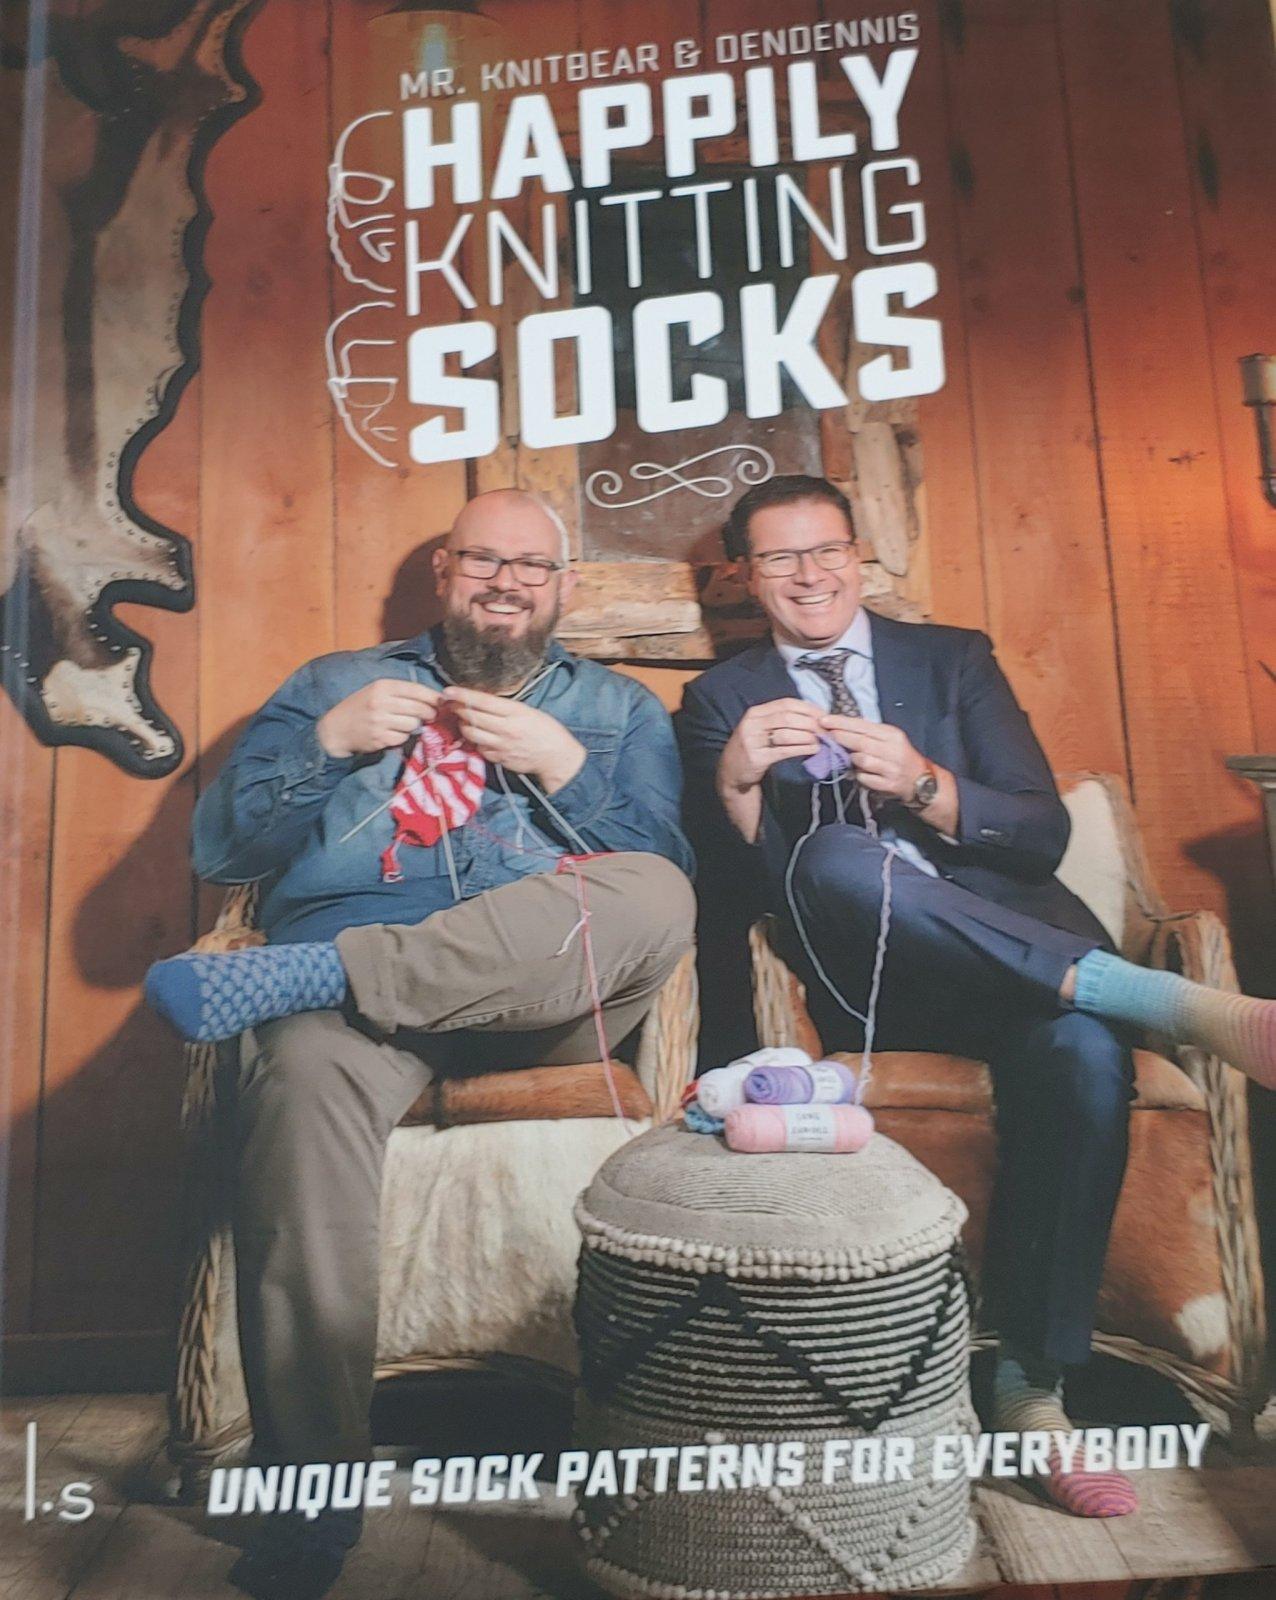 Mr. Knitbear & Dendennis Happily Knitting Socks